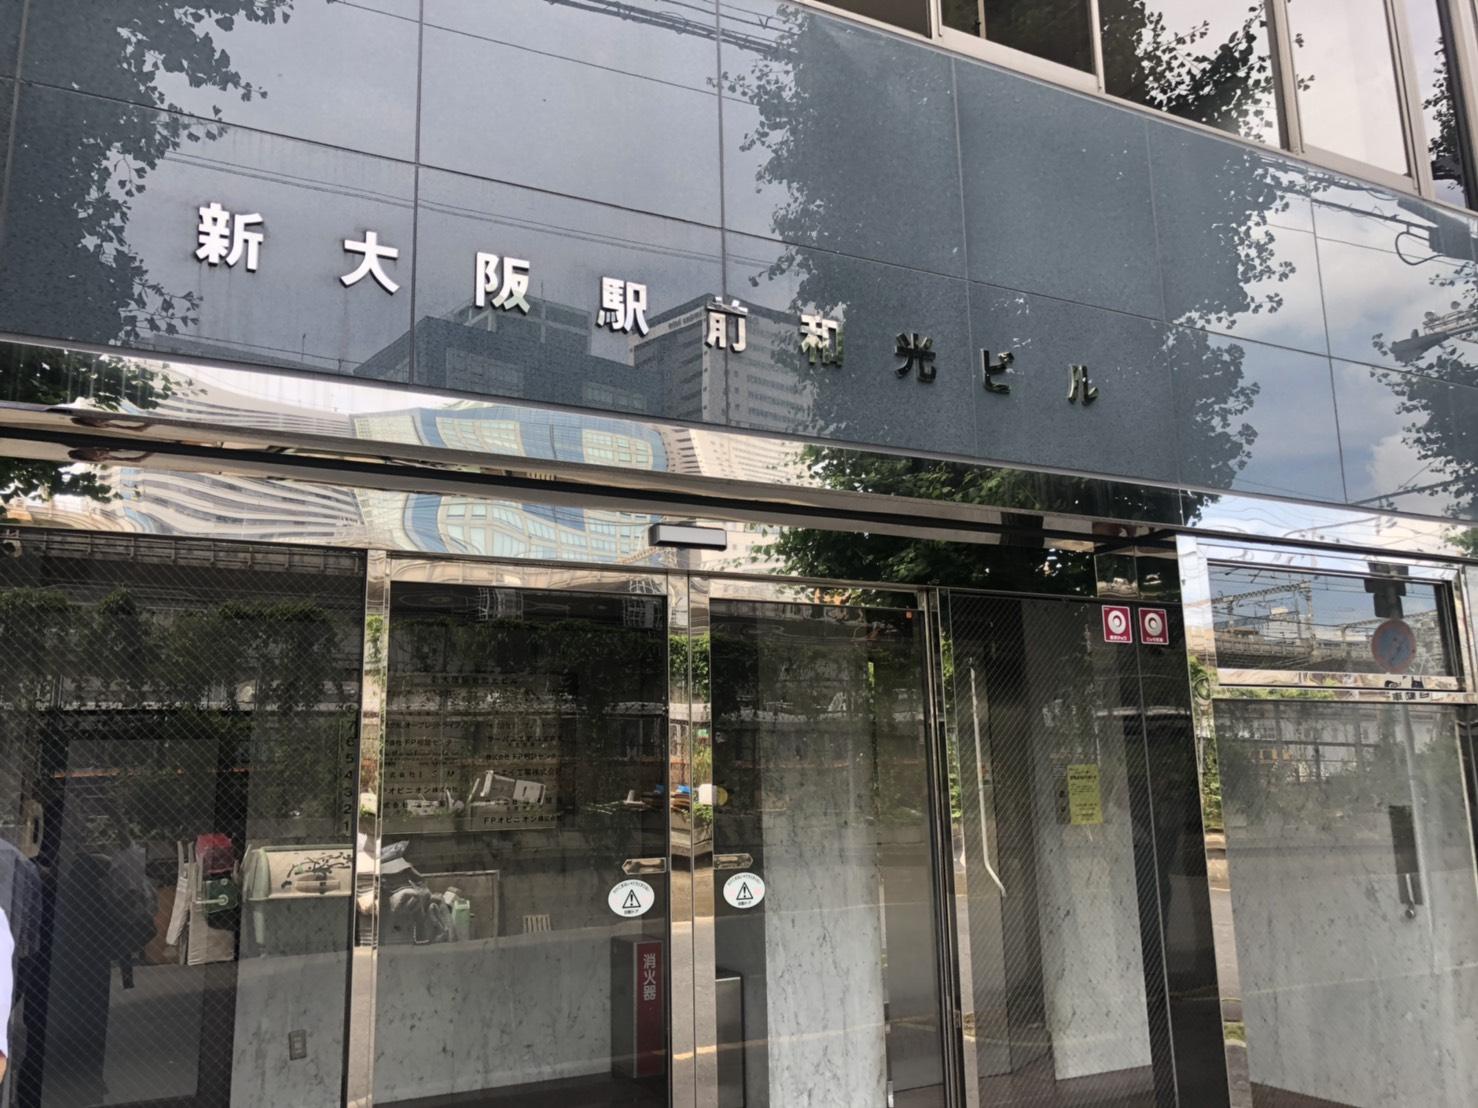 新大阪駅前和光ビル